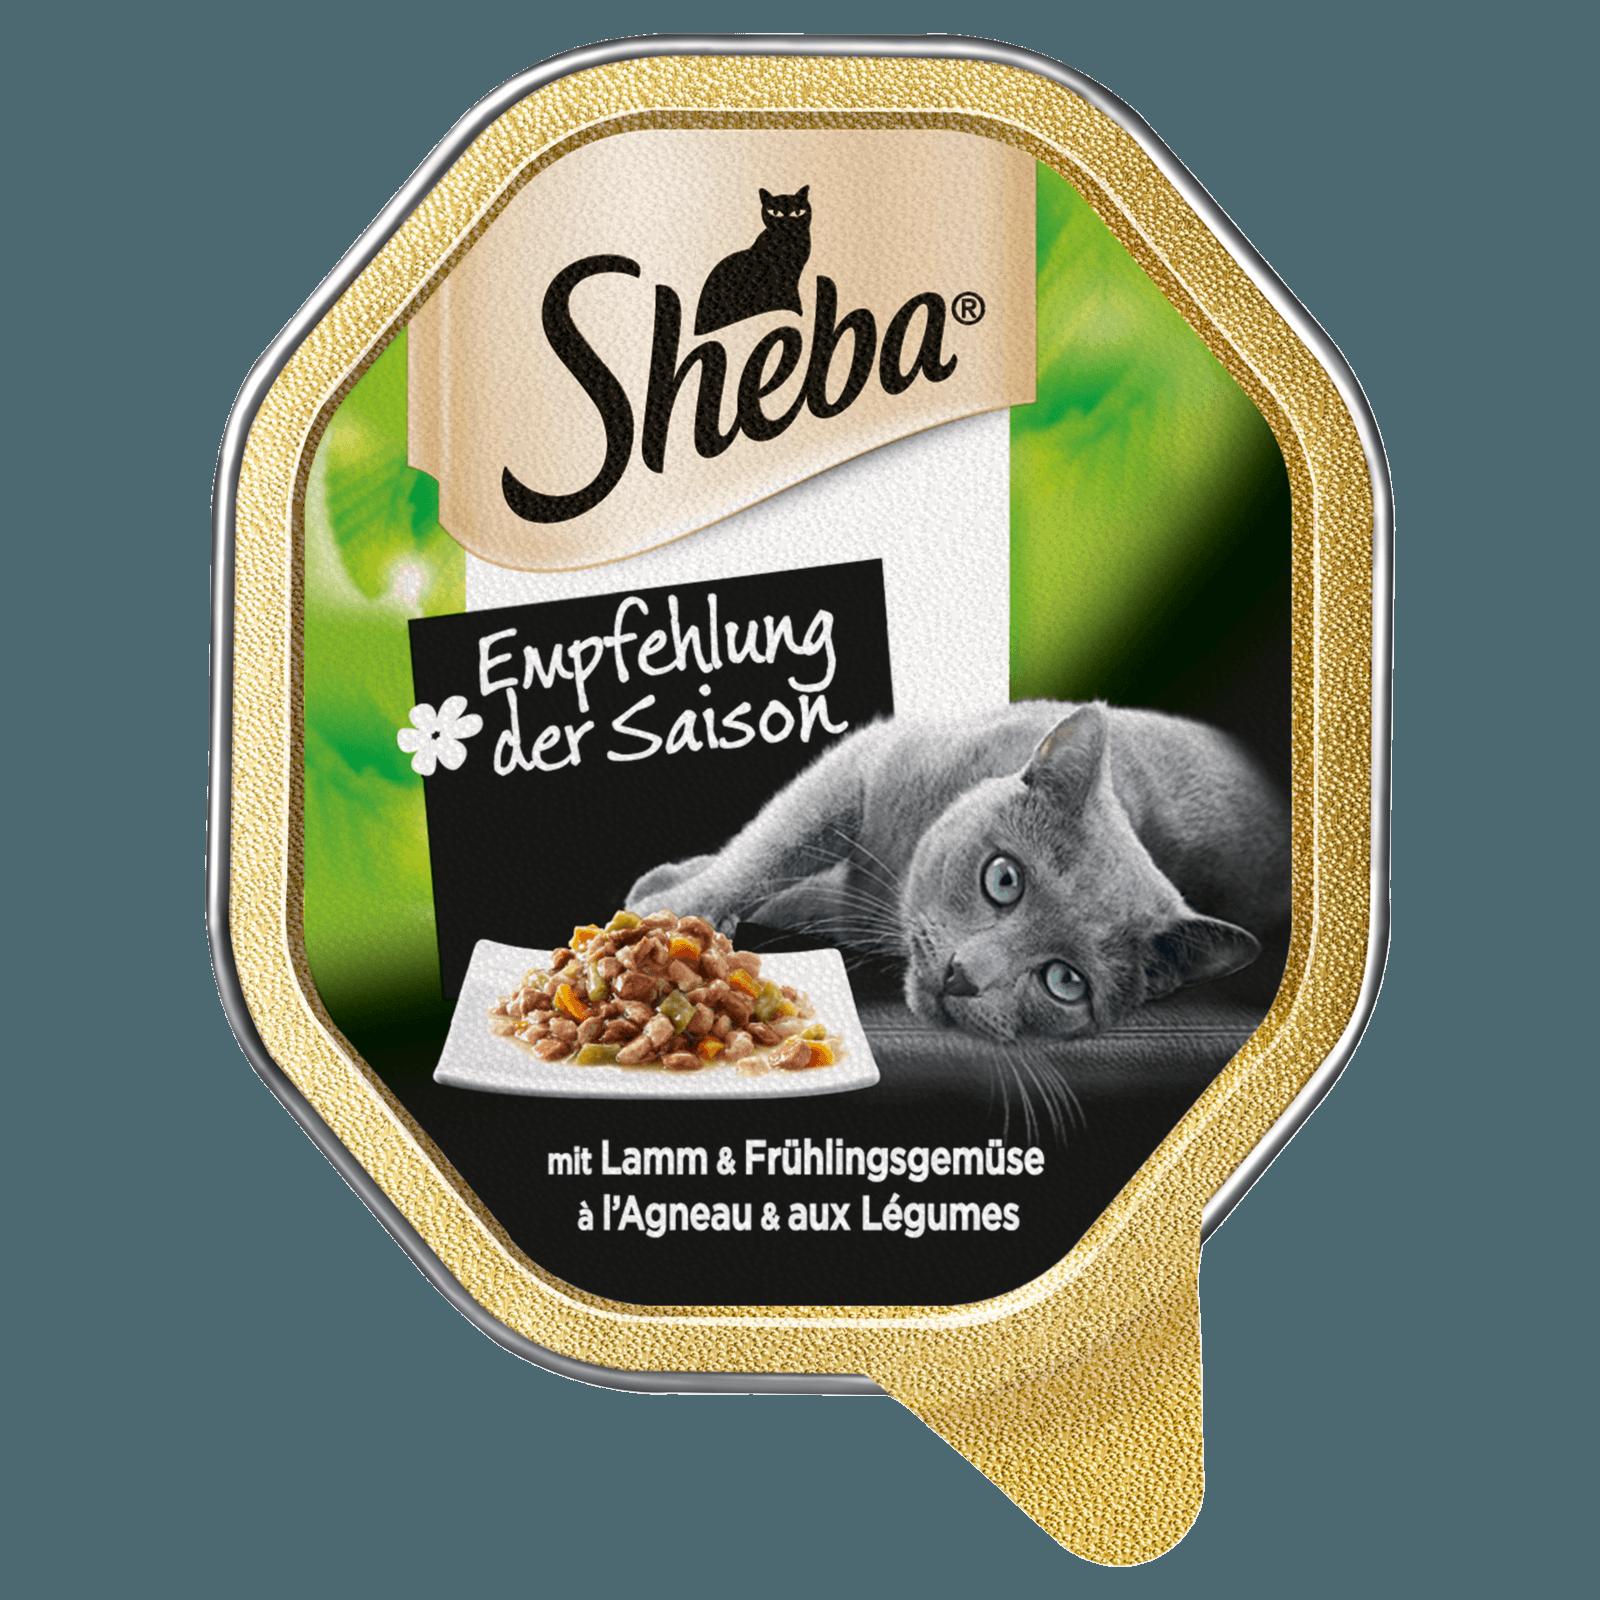 Sheba Katzenfutter Empfehlung der Saison 85g